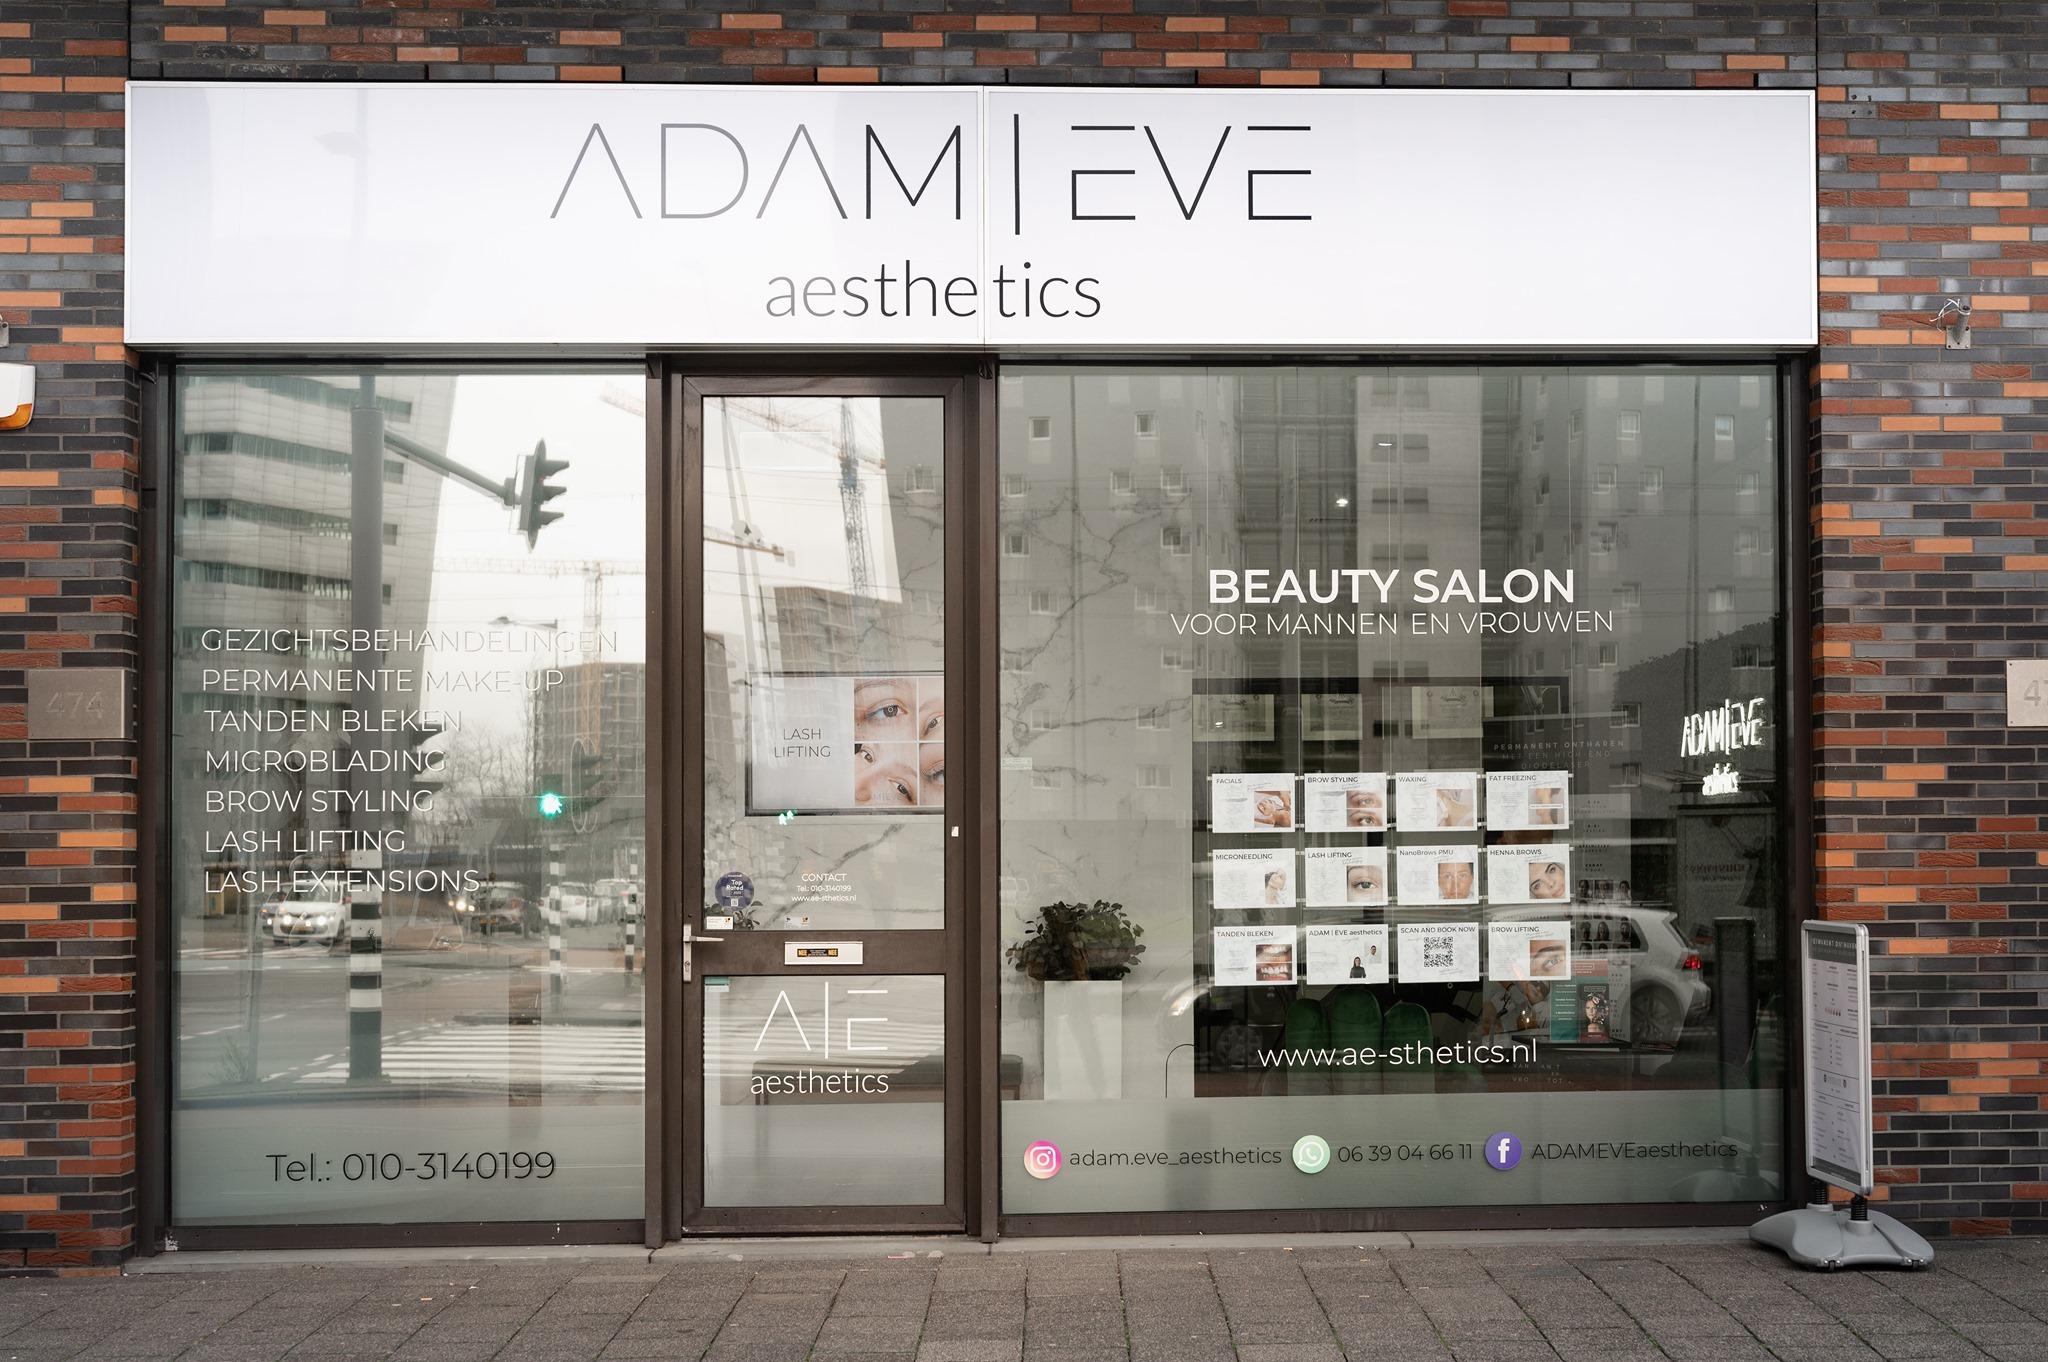 adam eve aesthetics